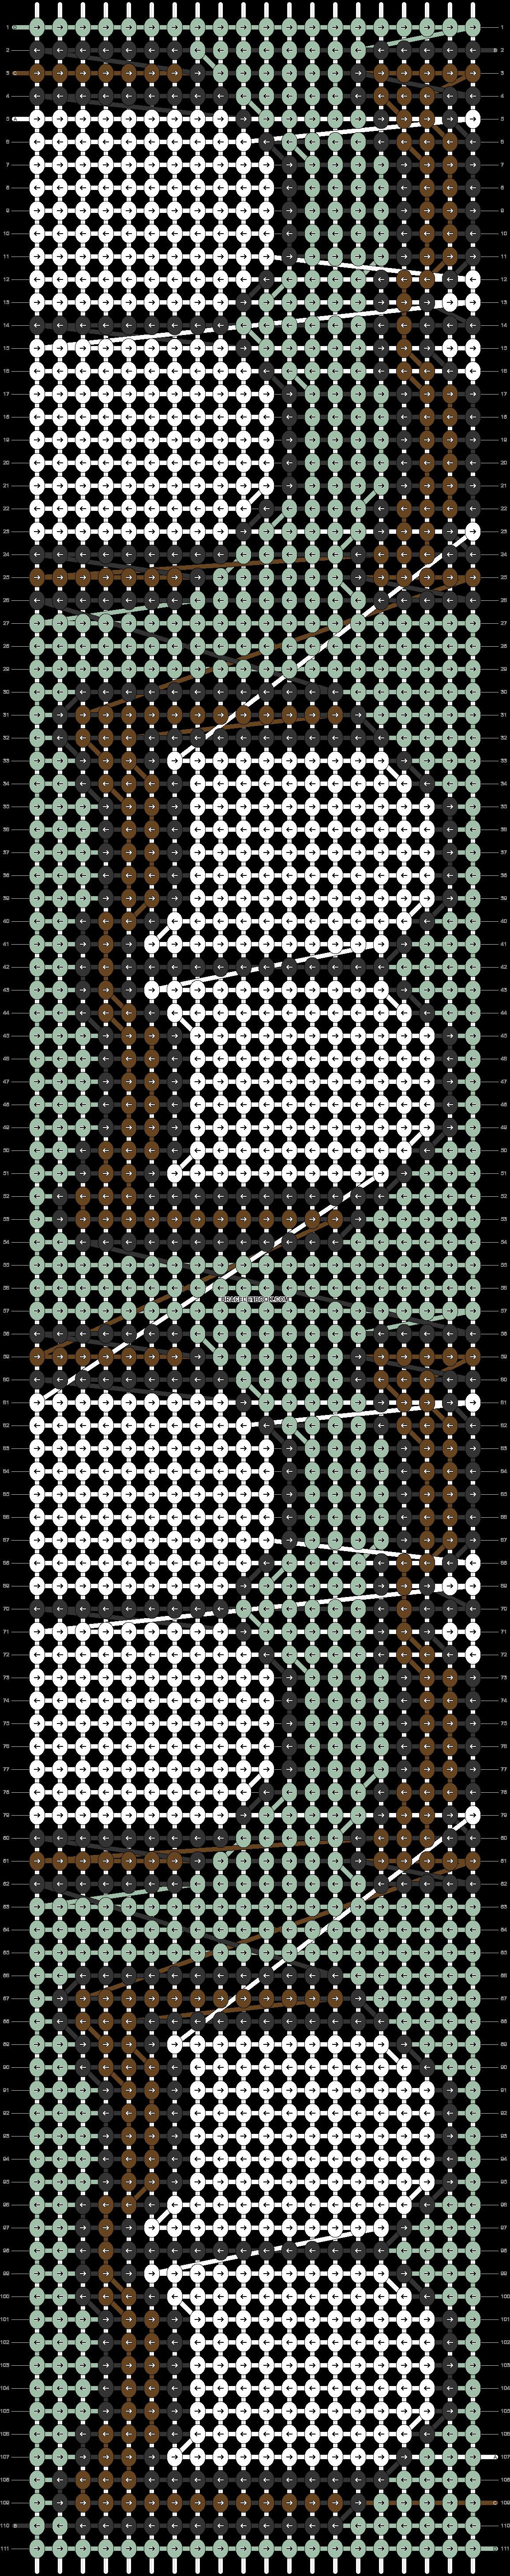 Alpha pattern #82089 pattern